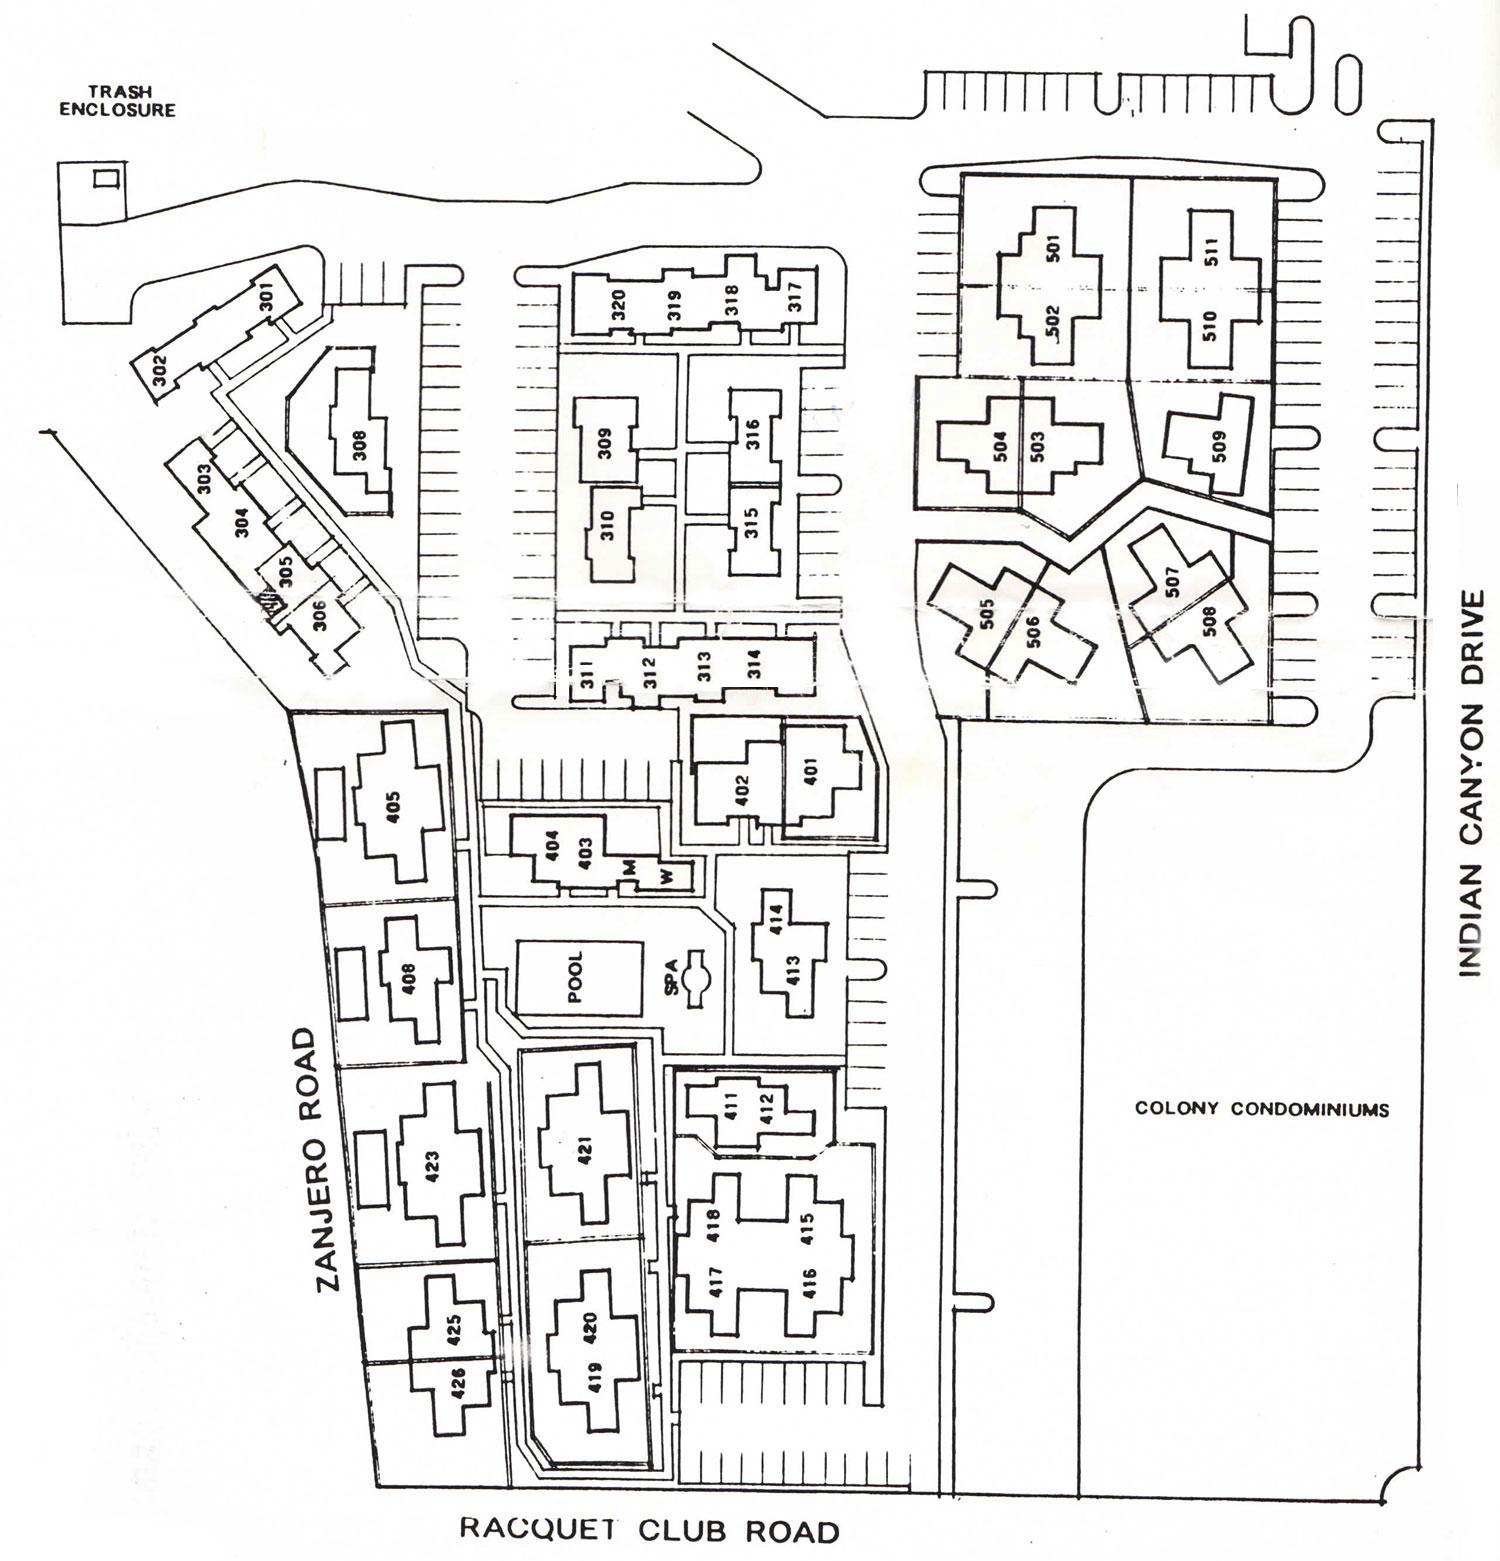 Royal Oaks Apartments Palm Desert: Palm Springs Condos & Apartments For Sale